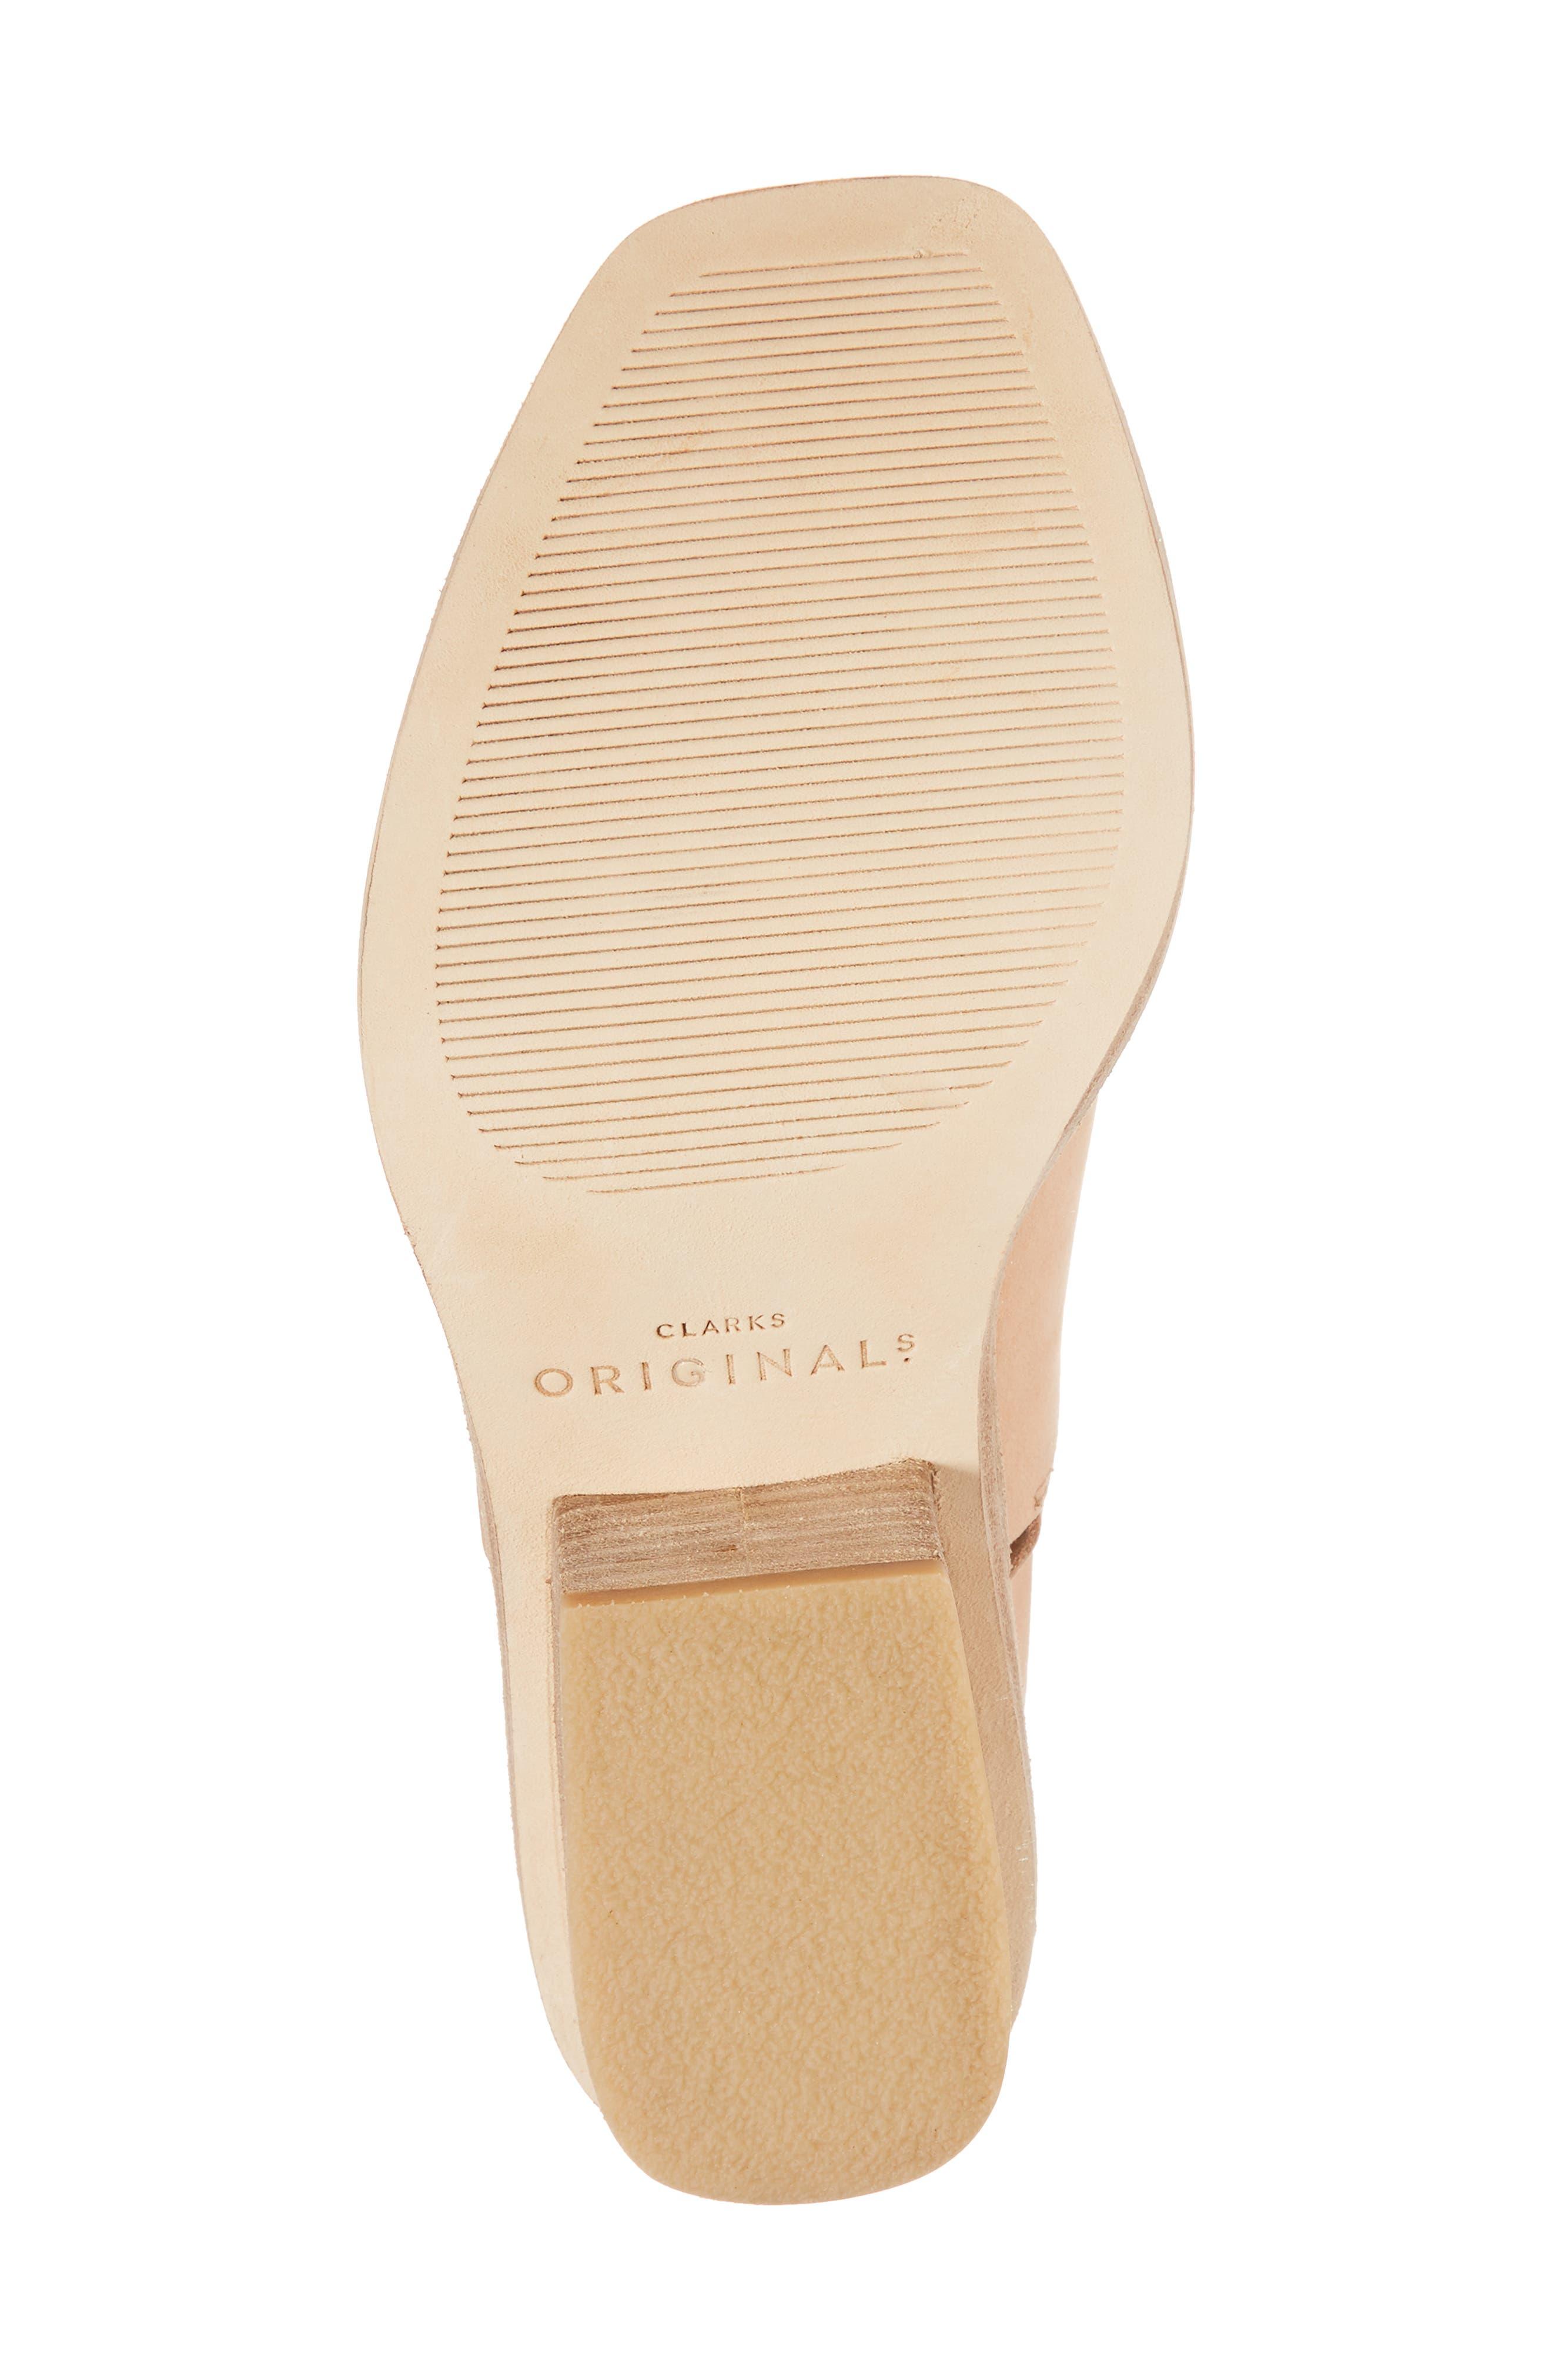 Clarks Bermudan Block Heel Sandal,                             Alternate thumbnail 6, color,                             Sandstone Nubuck Leather